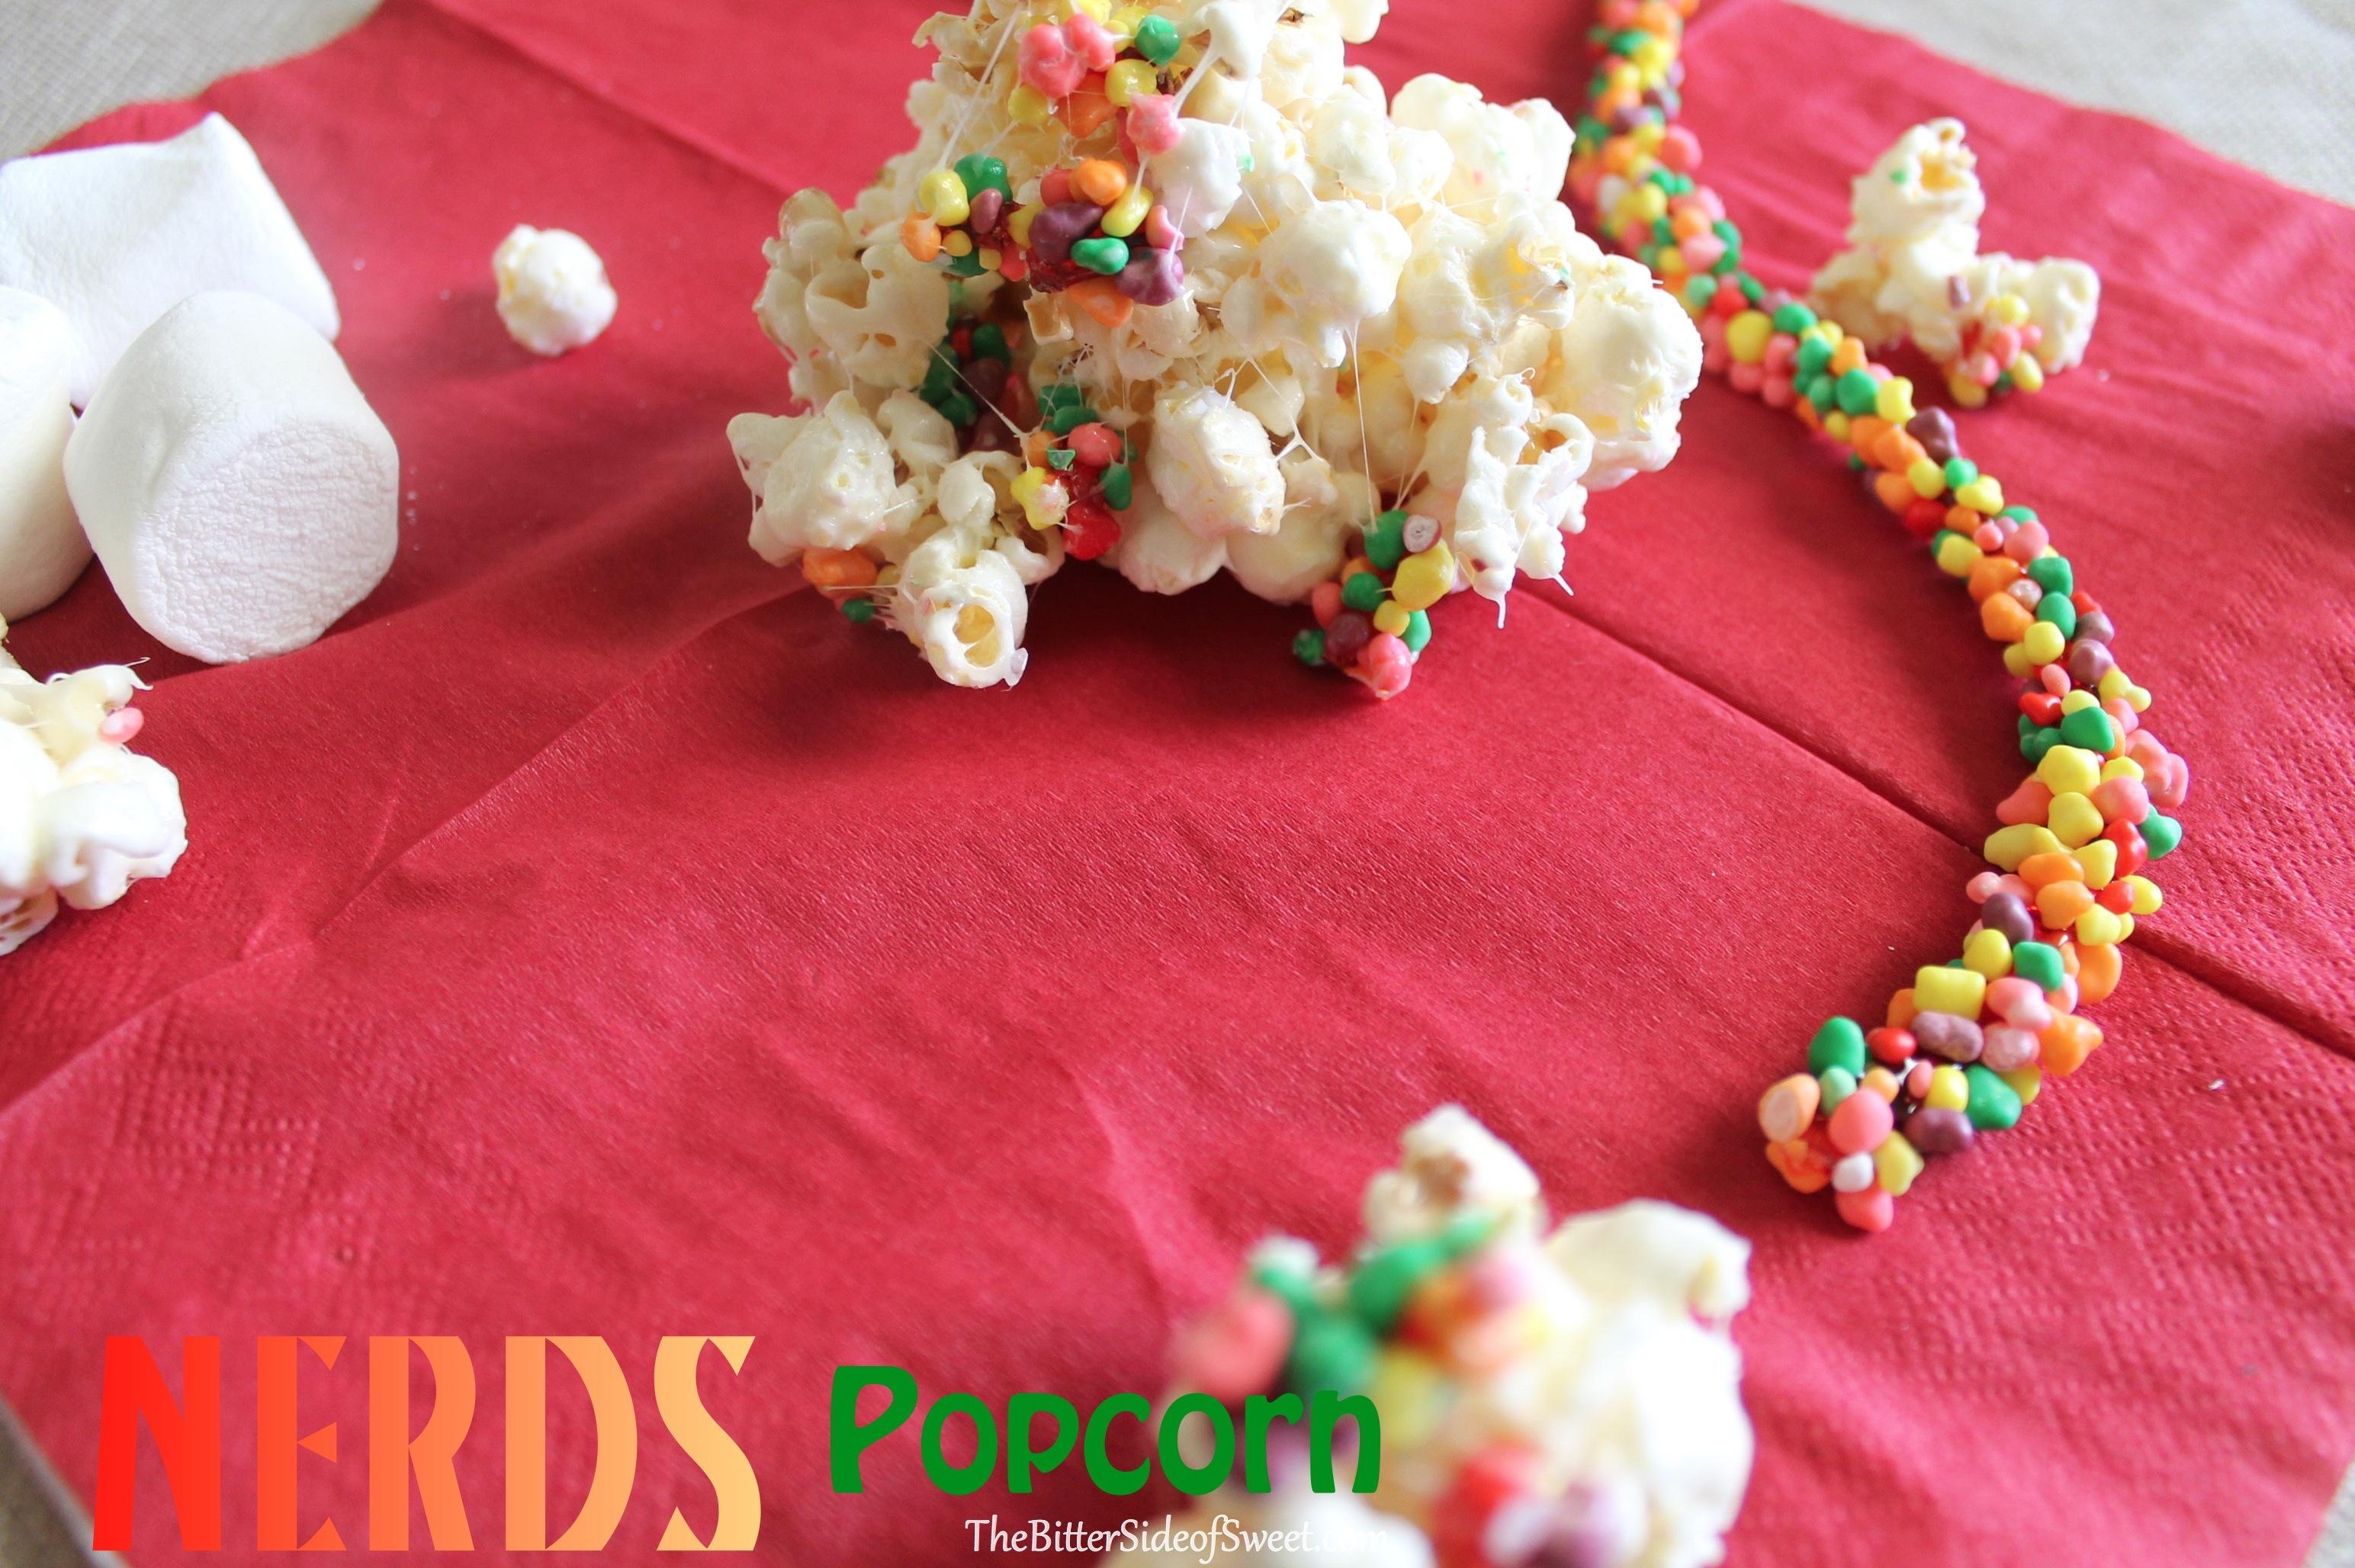 Rainbow Nerds Rope Candy Popcorn